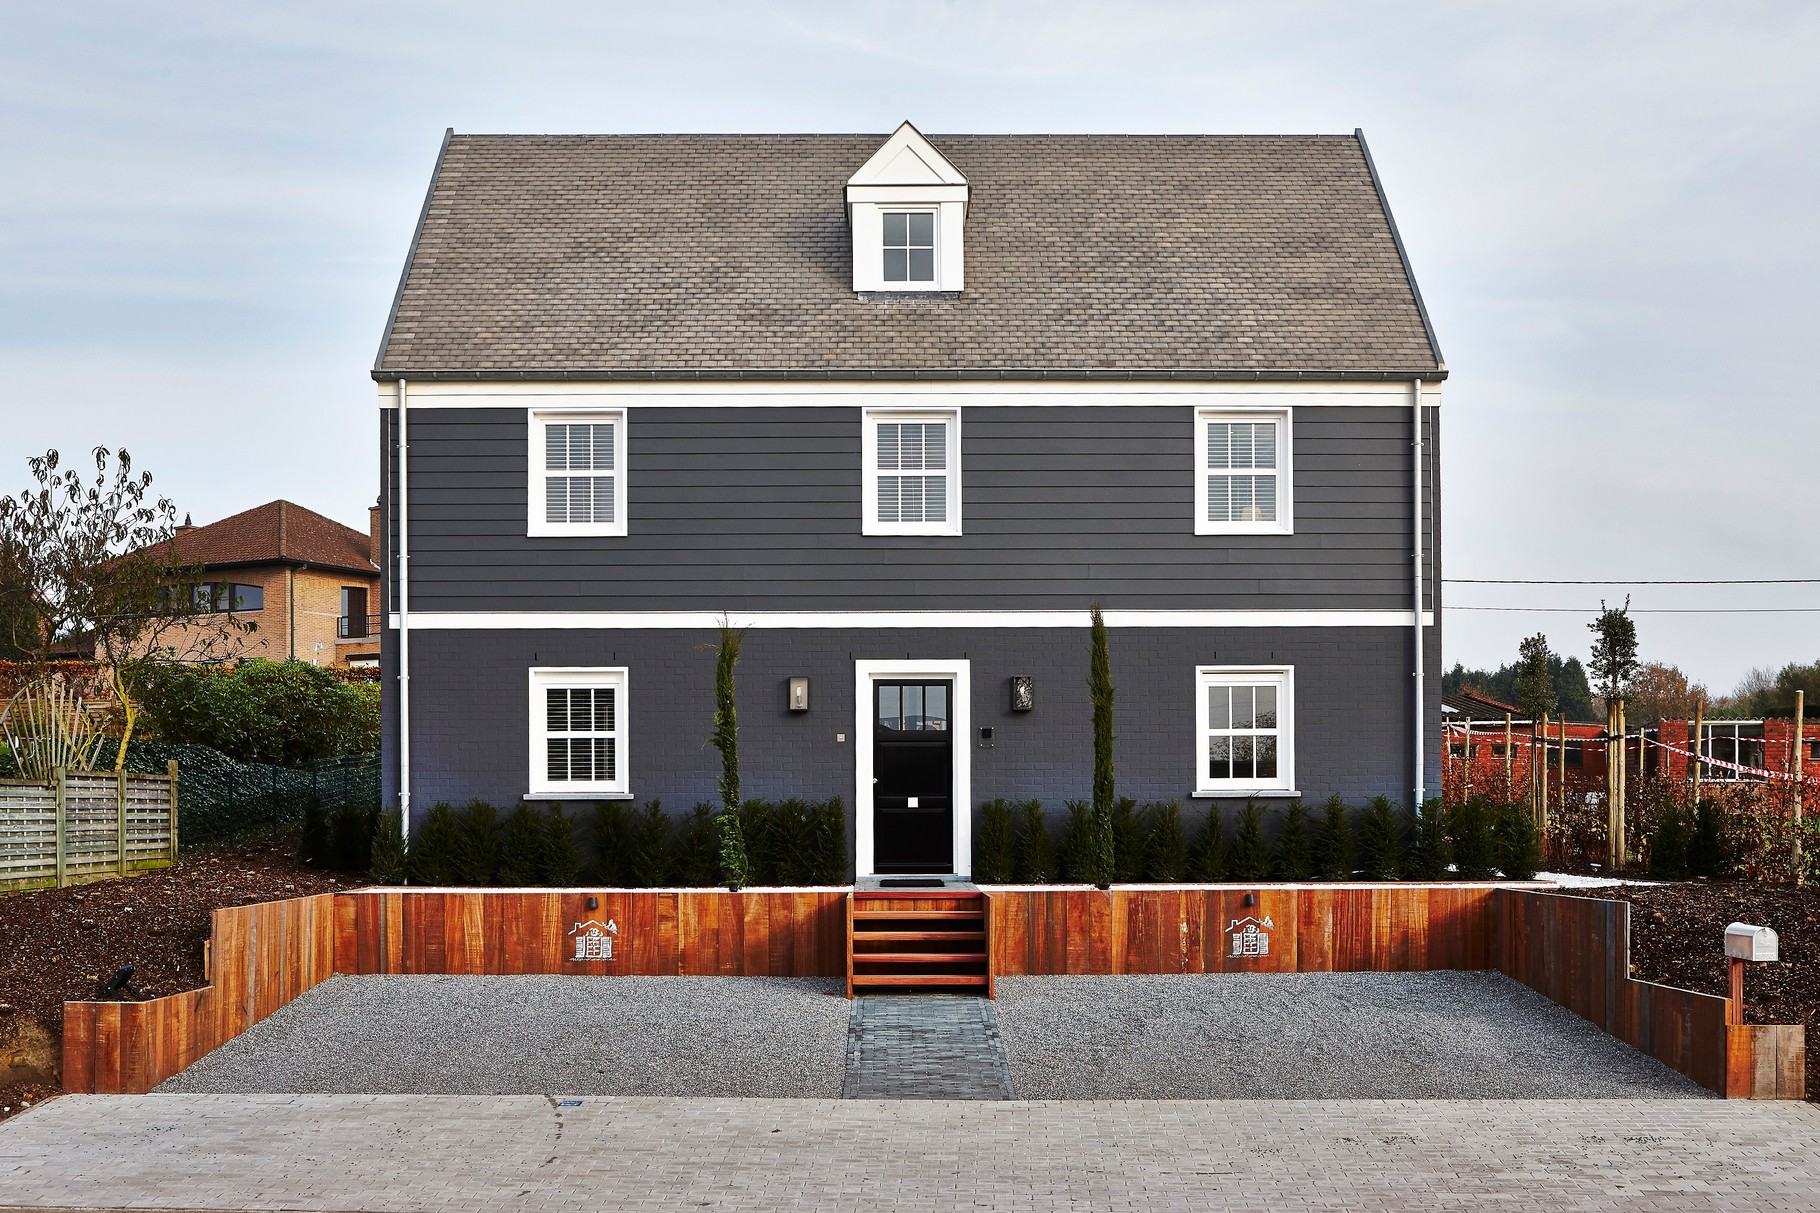 accueil mi casa lorraine. Black Bedroom Furniture Sets. Home Design Ideas